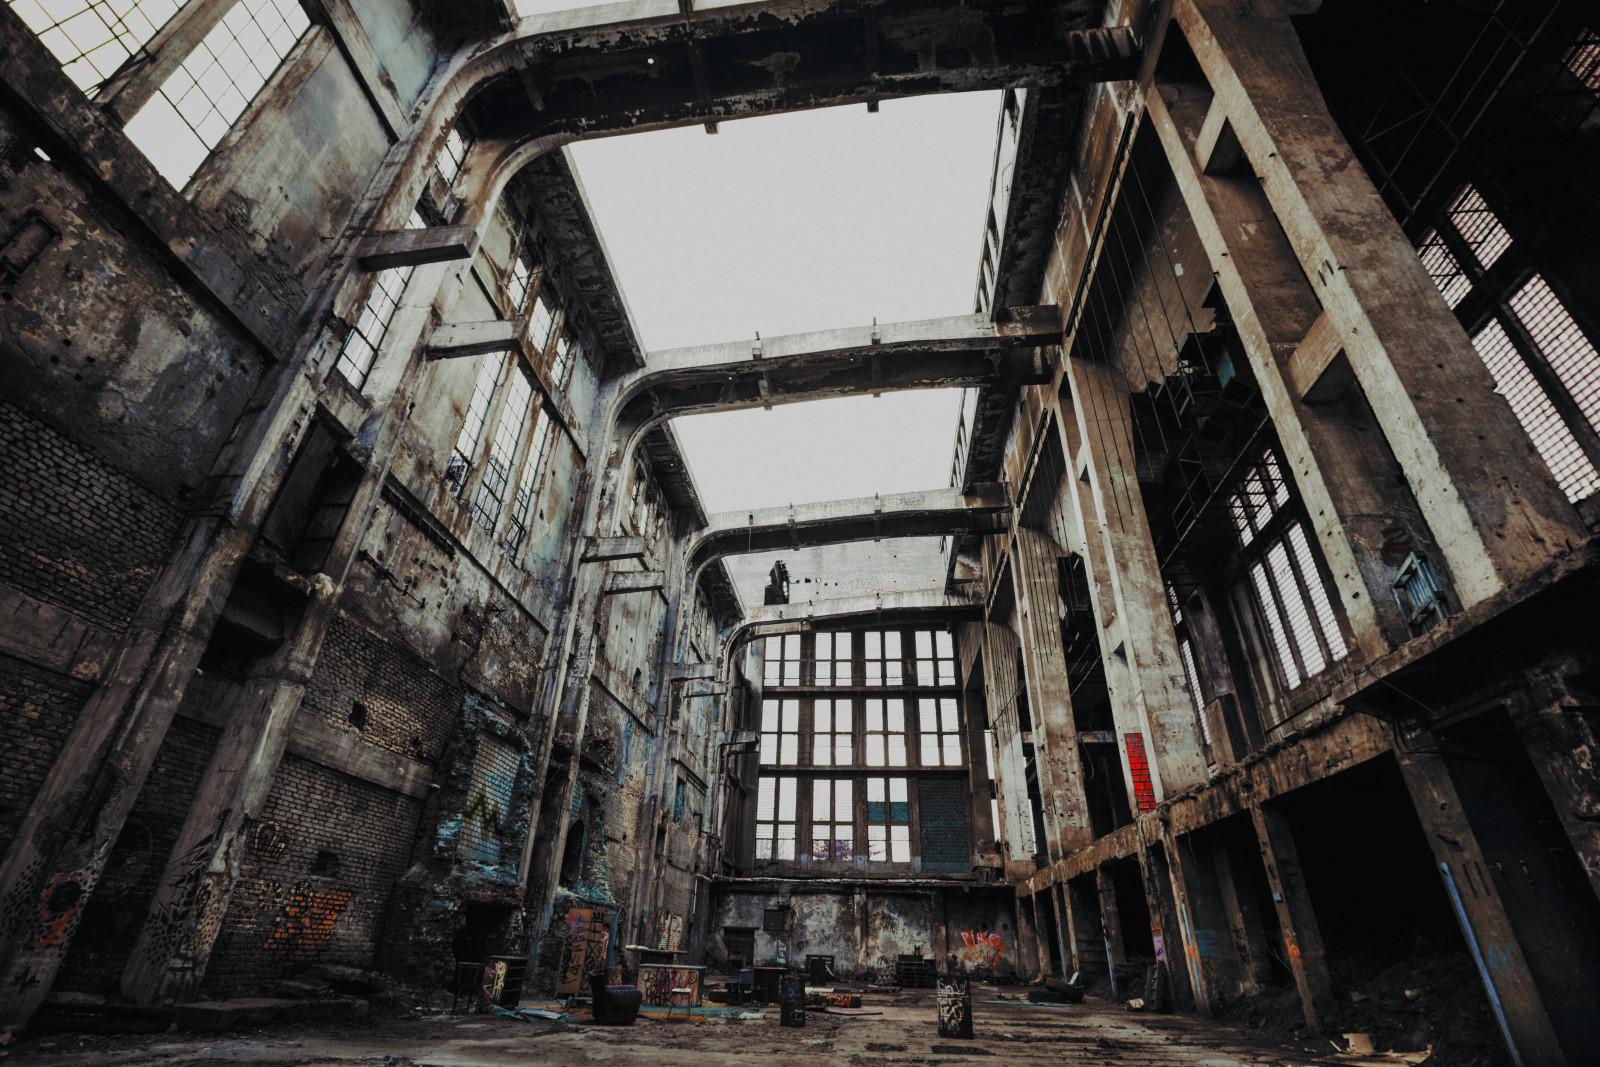 Industriel - Le Hangar